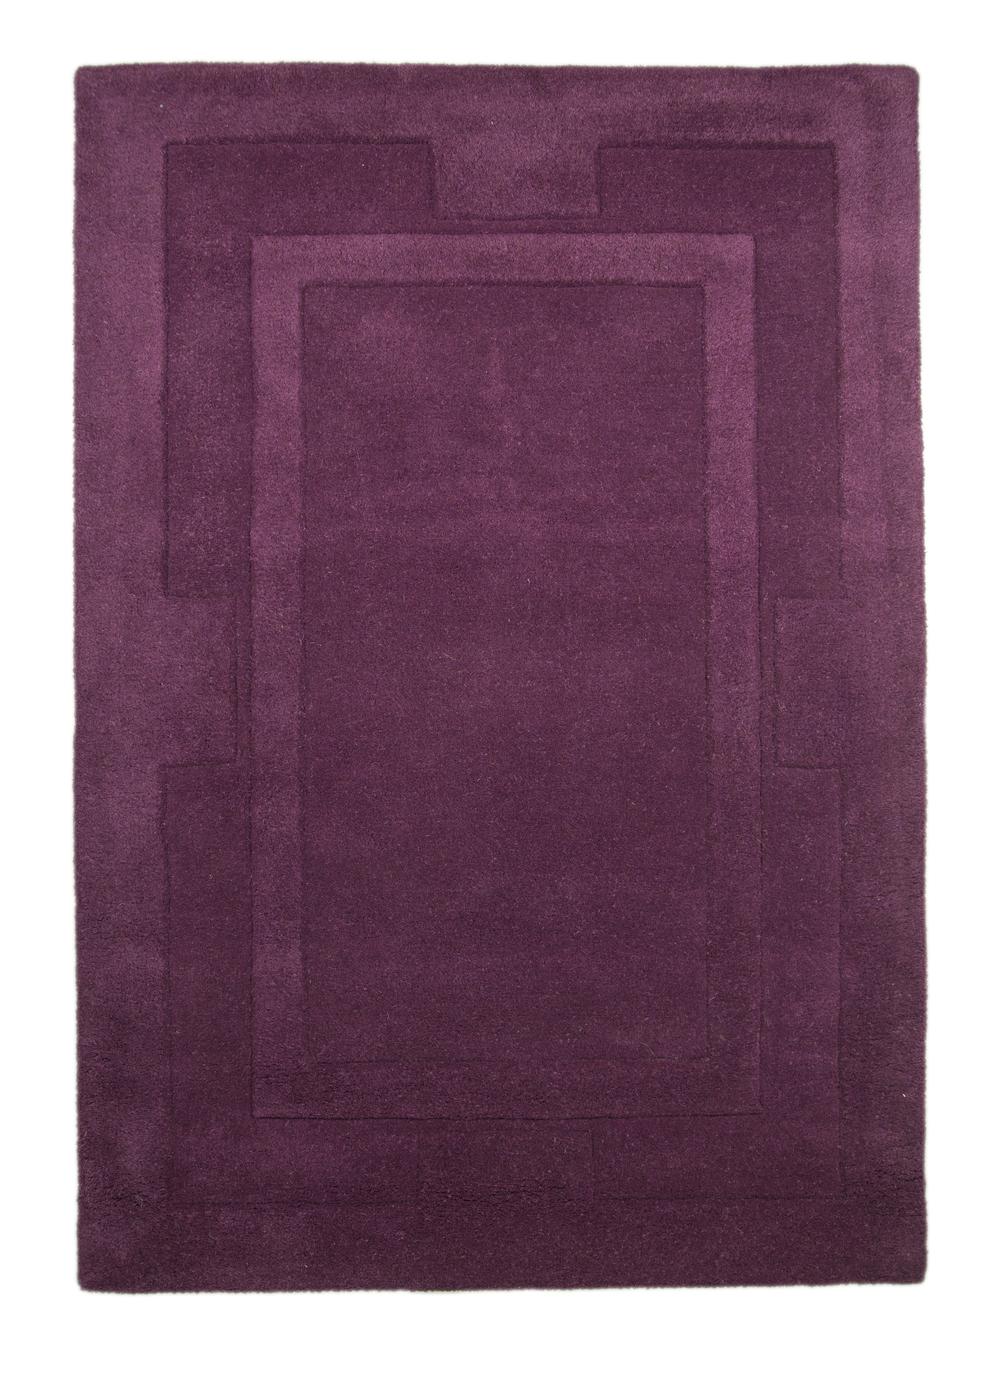 sierra_apollo_purple_8C3BDBC1E0A24859B5BC3D51275FC0F2 (1)